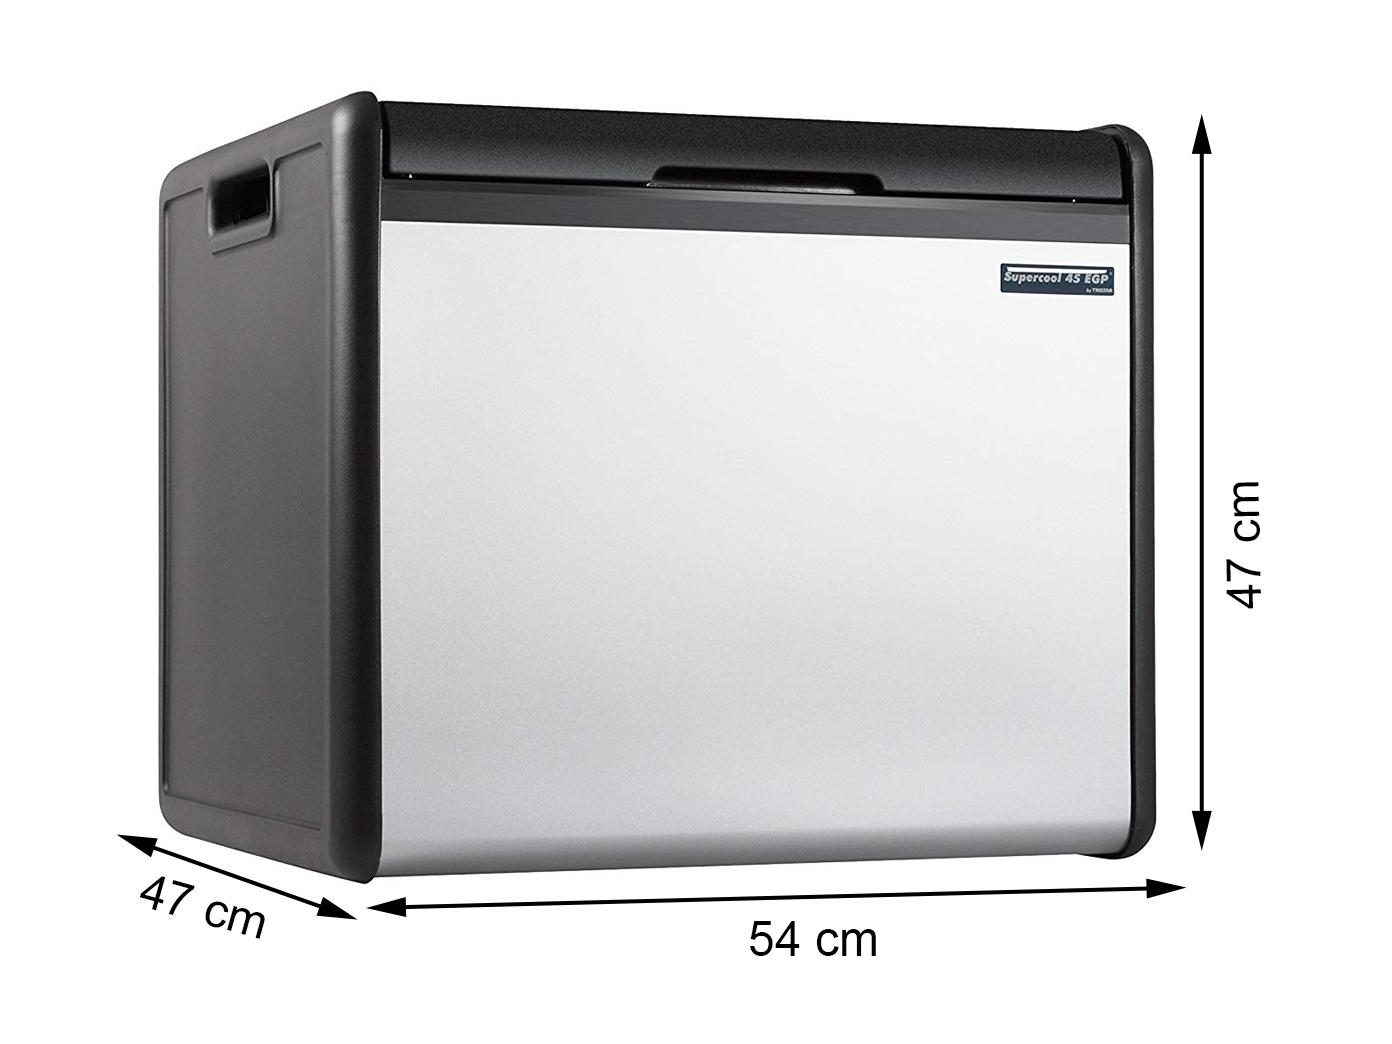 XL Kühlbox 39L 2l Fl. geeignet Edelstahlblende Gas-Betrieb Kühltasche 12V 230V